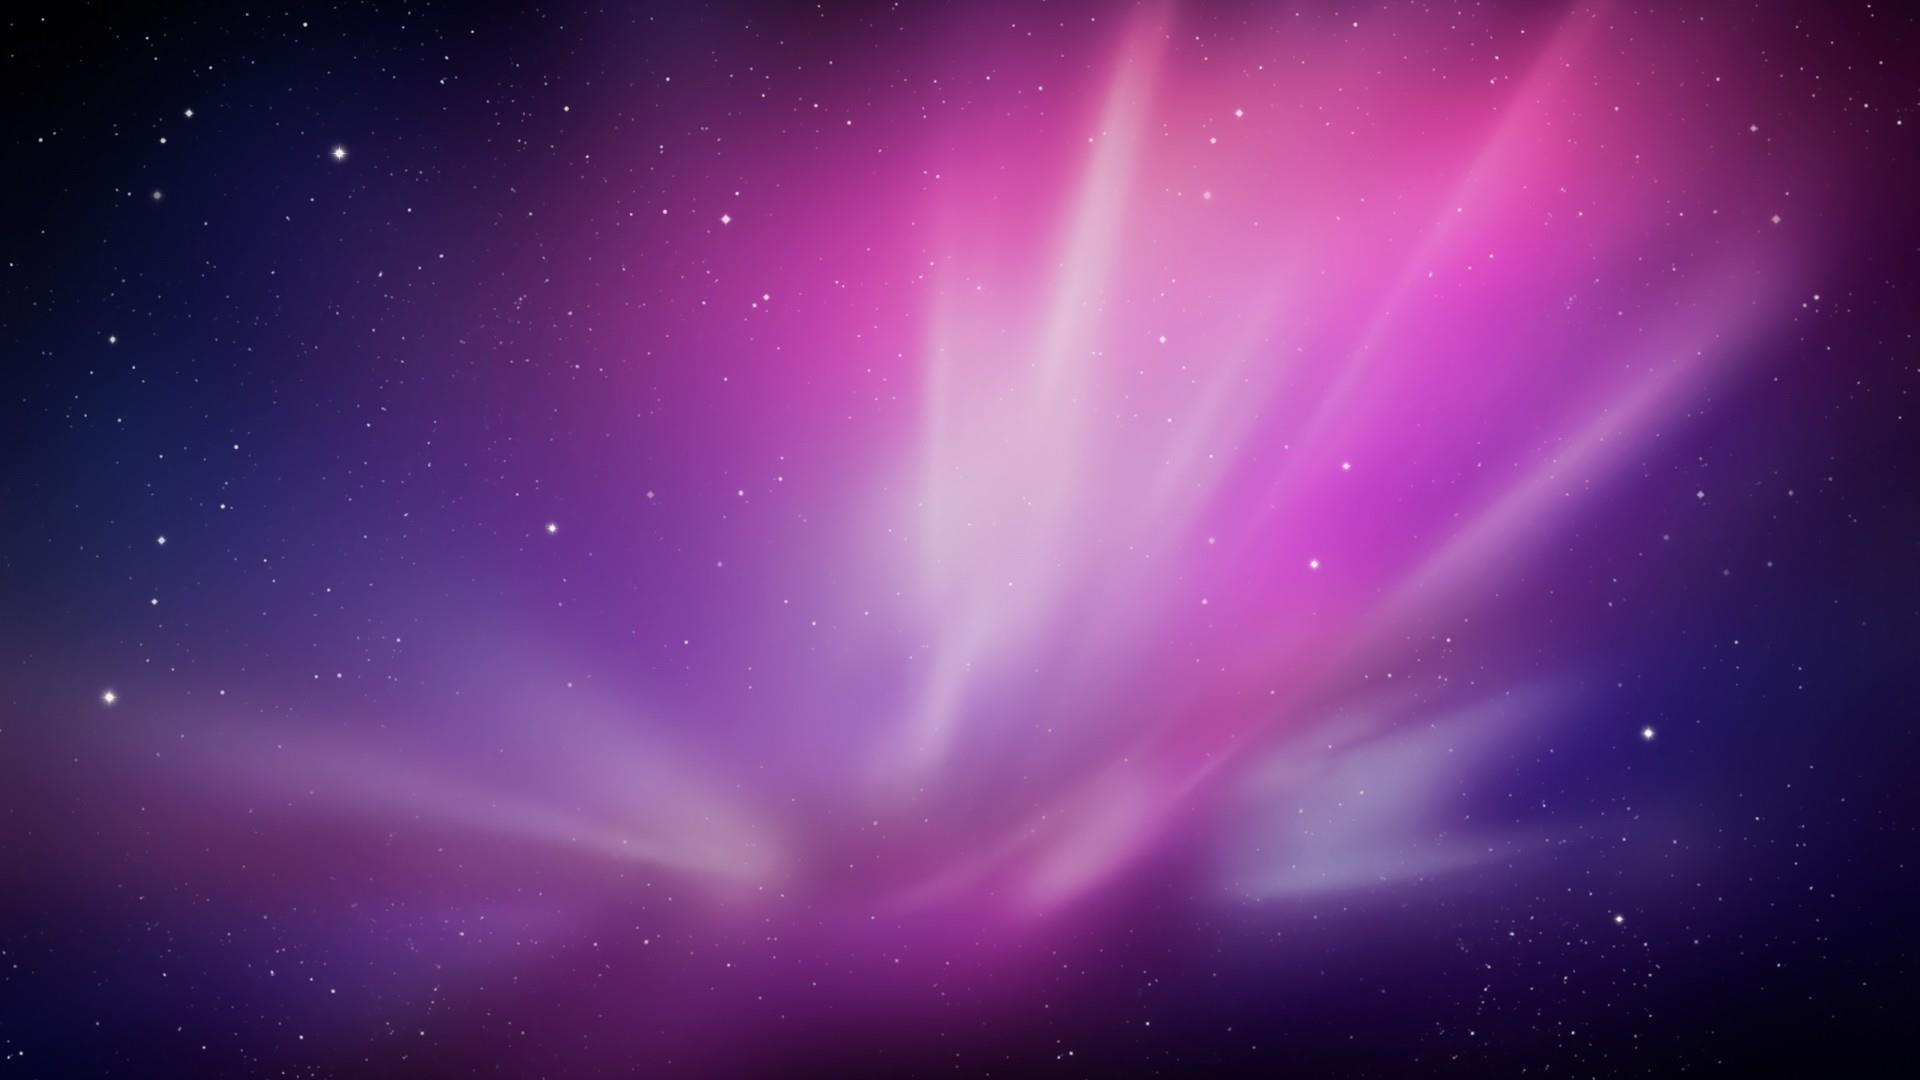 Title. Purple galaxy